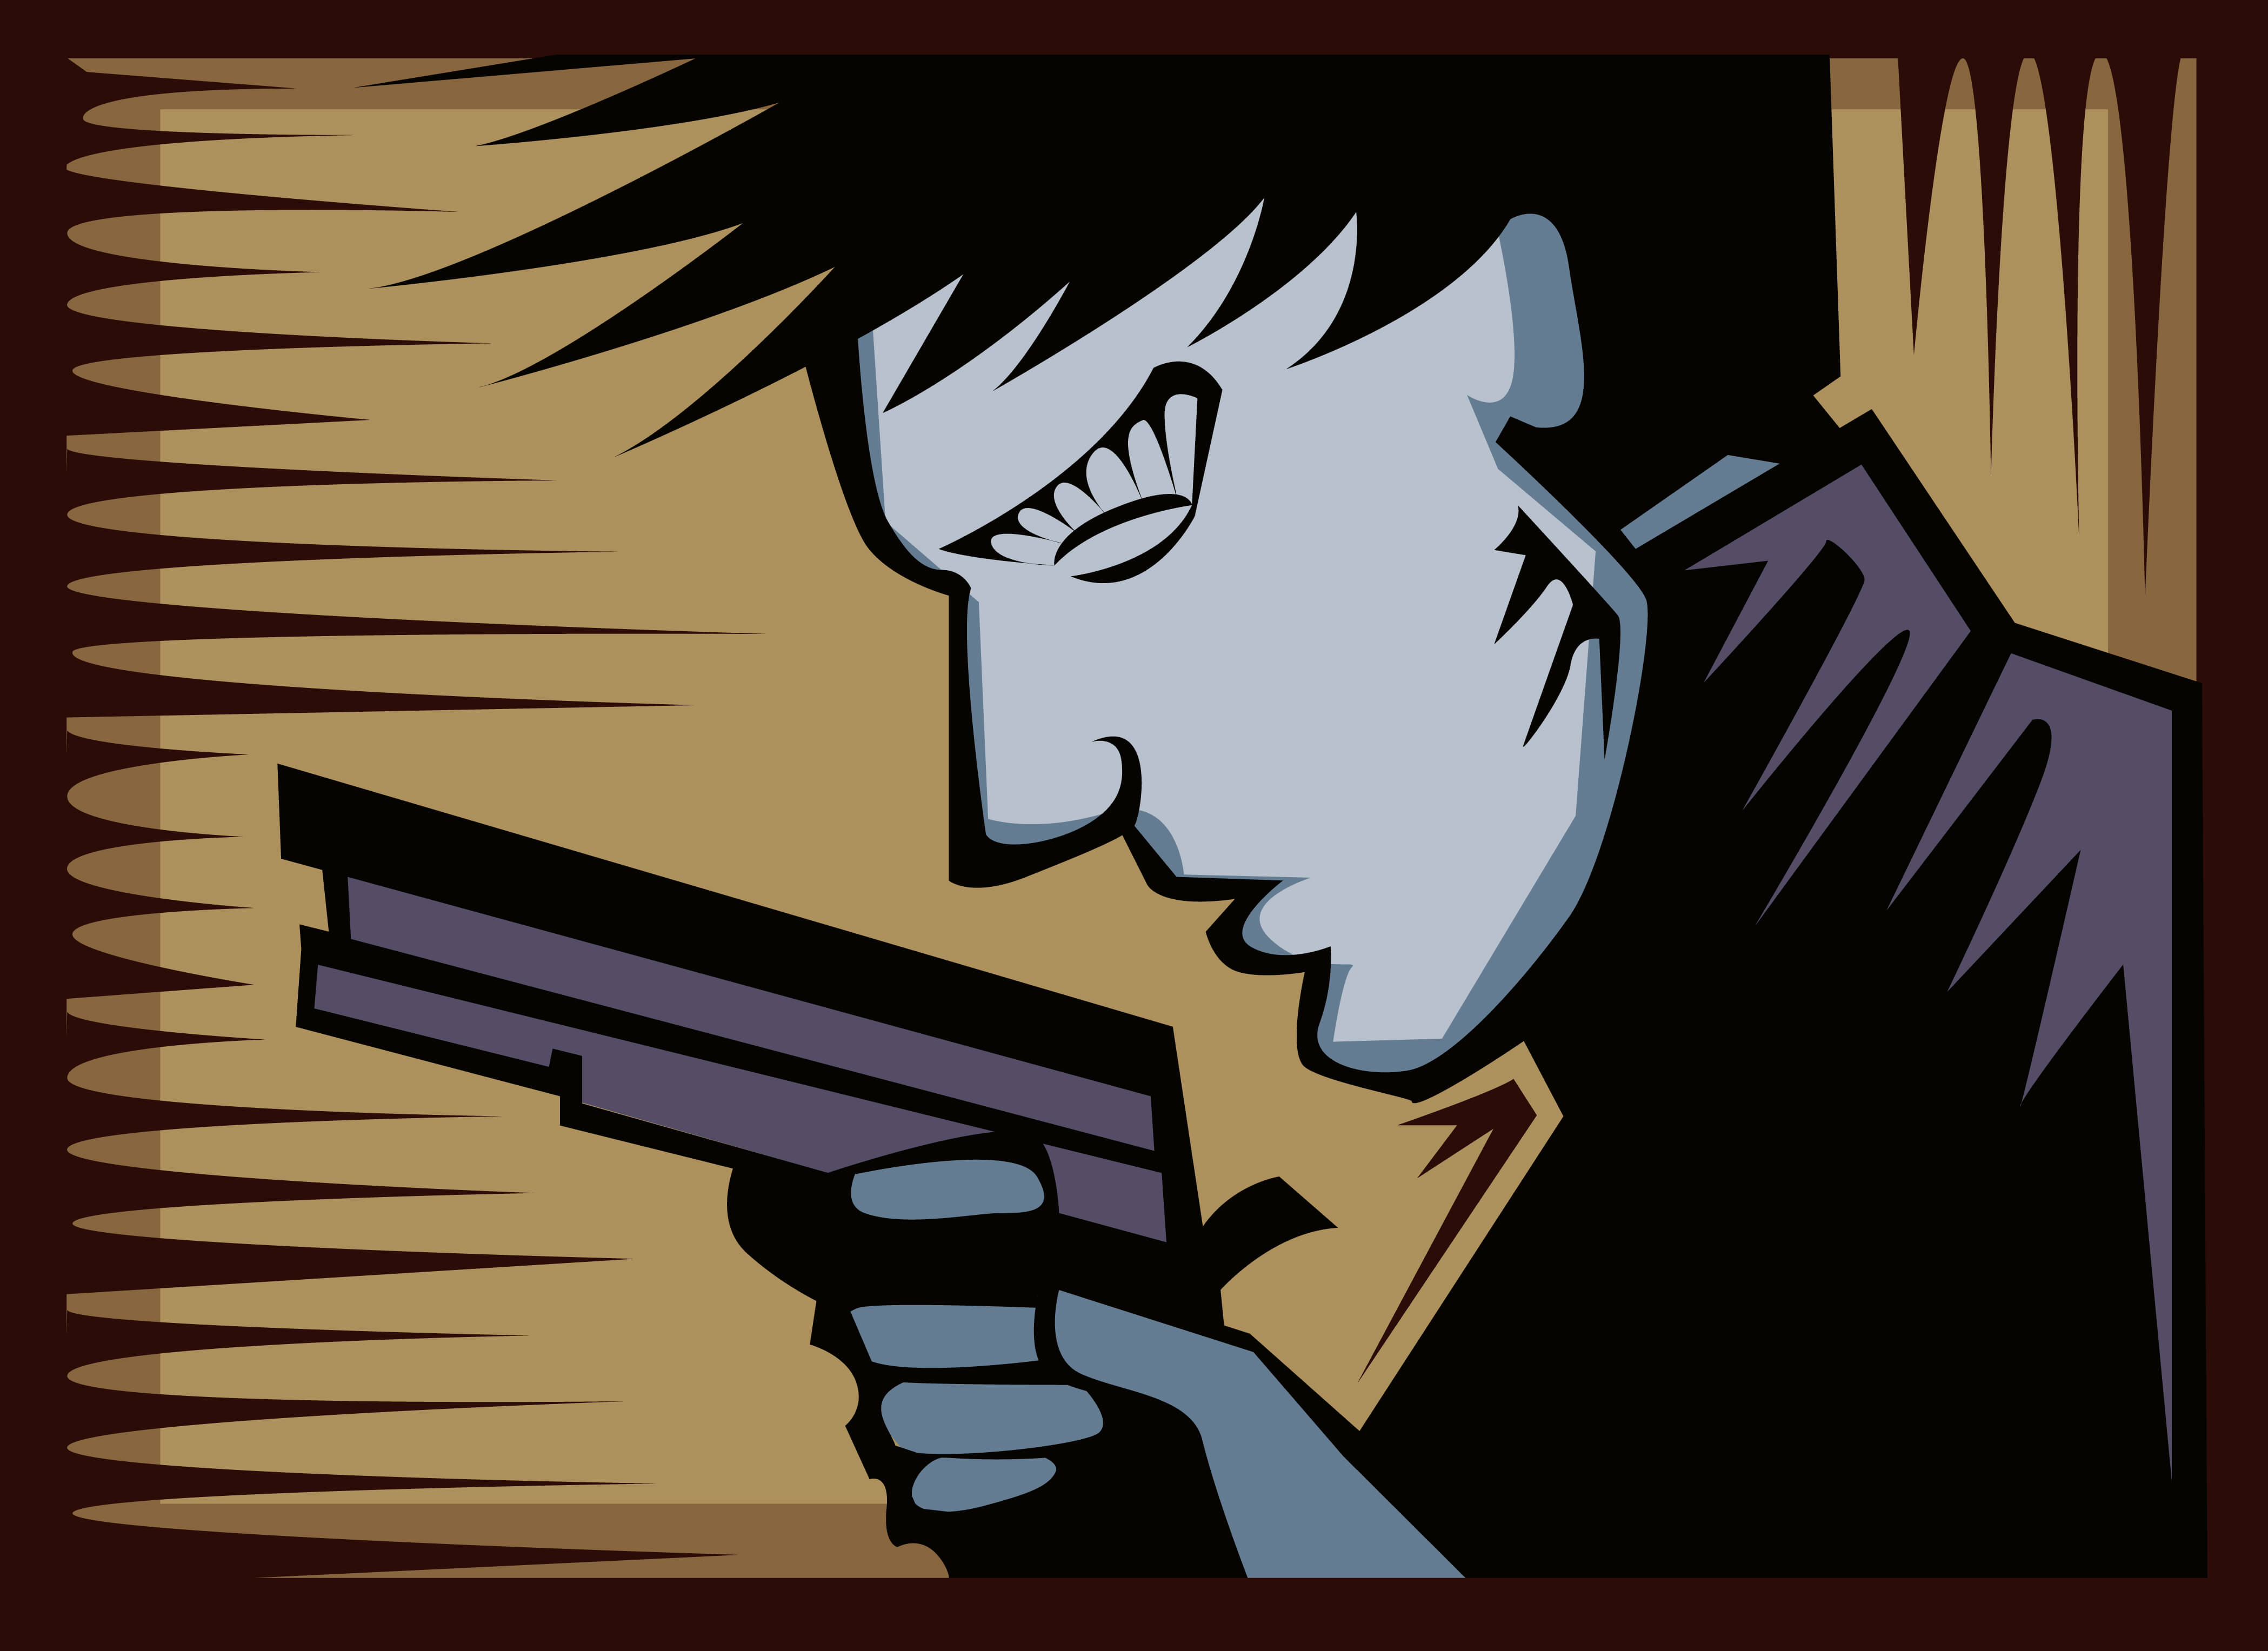 gun control logic